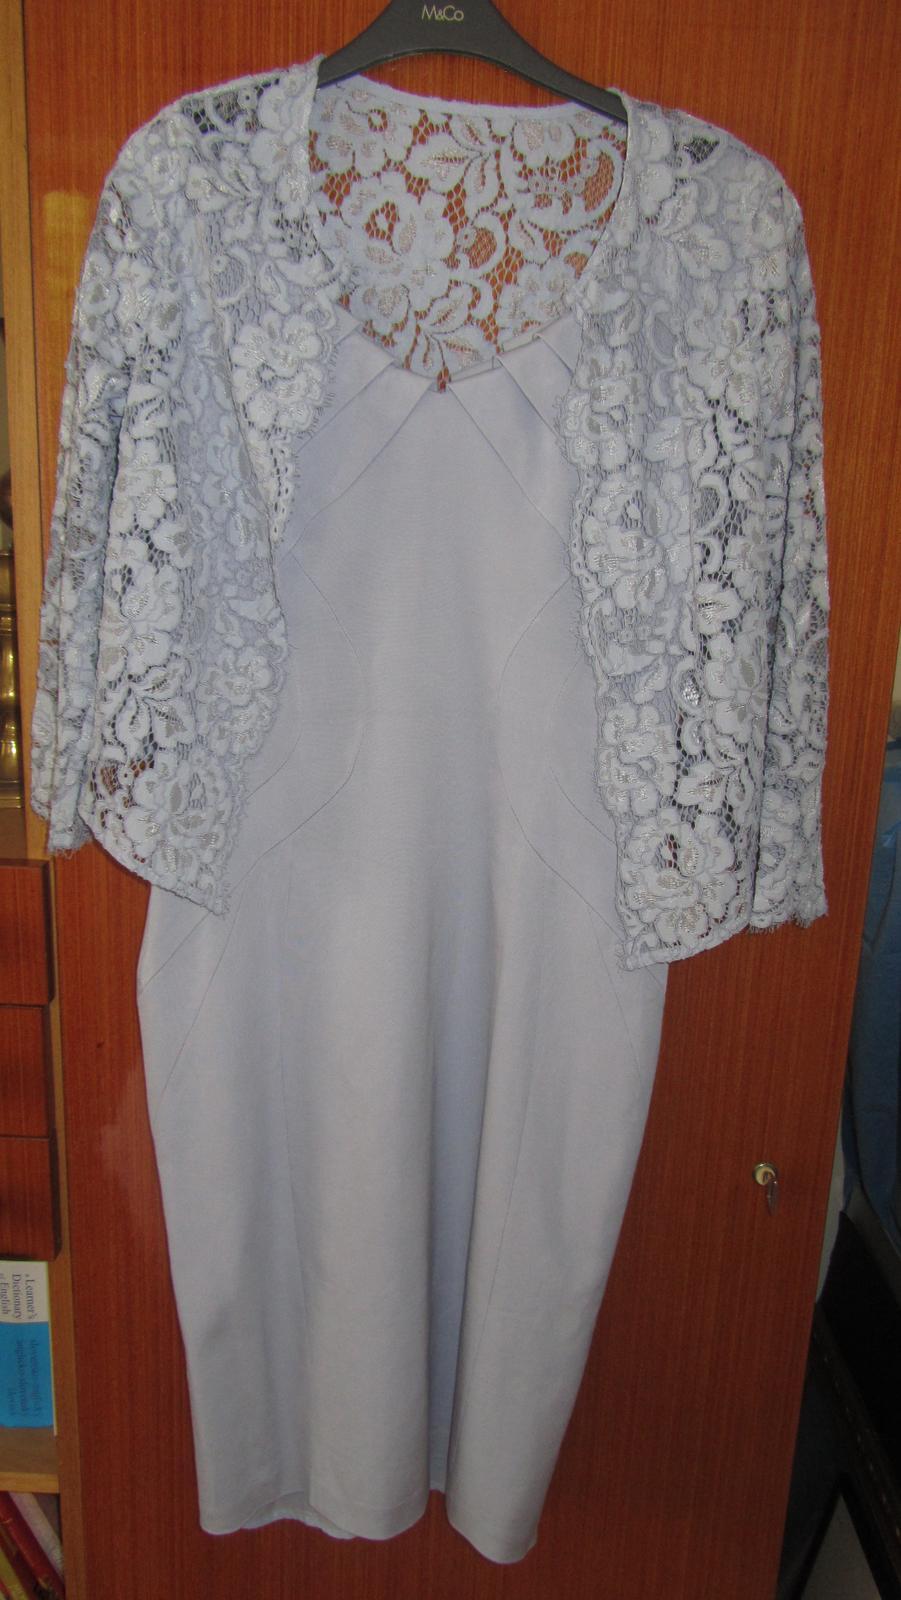 šaty + bolerko čipkované - Obrázok č. 1